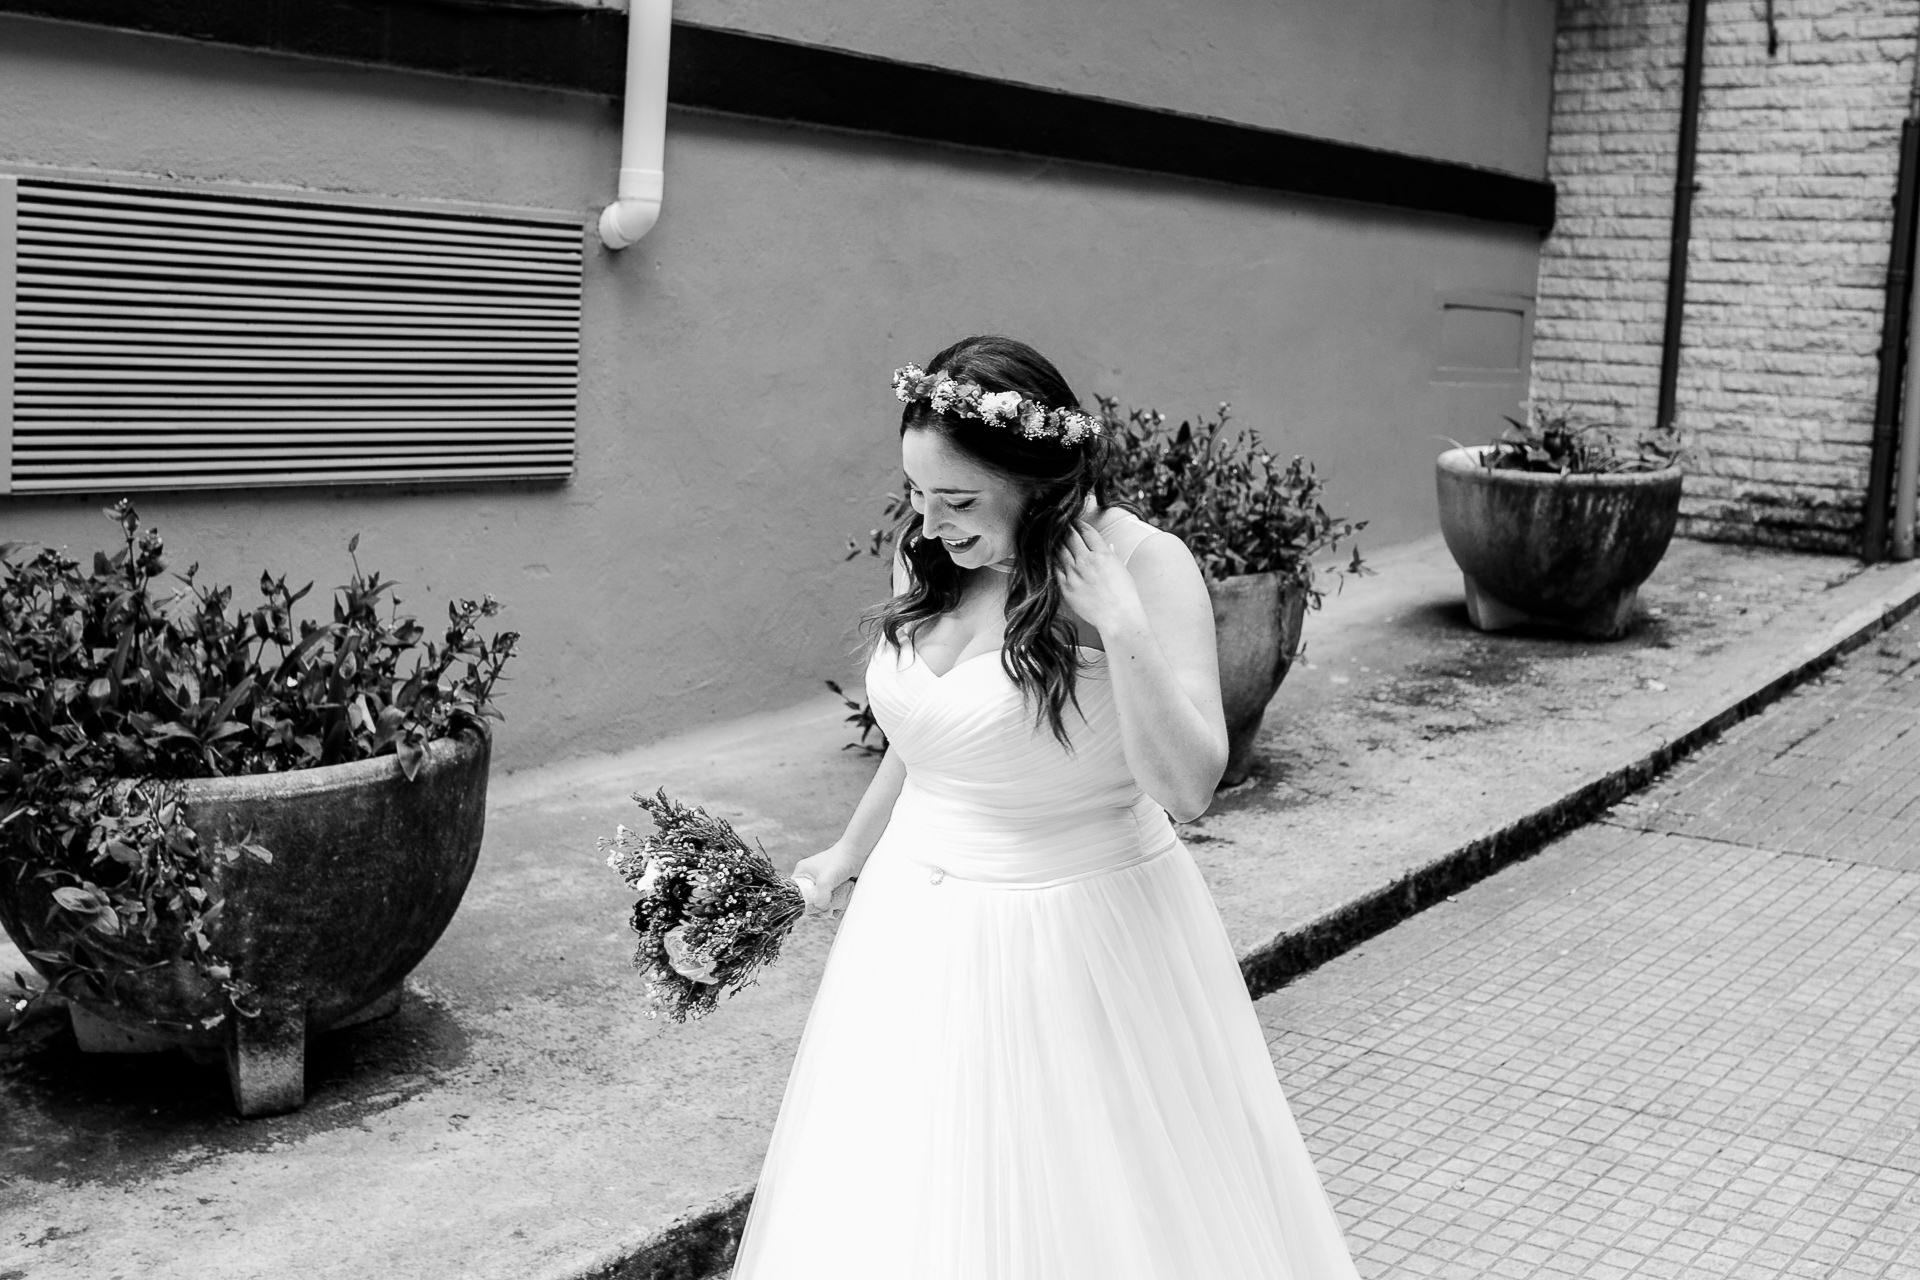 boda civil restaurante lola 113838